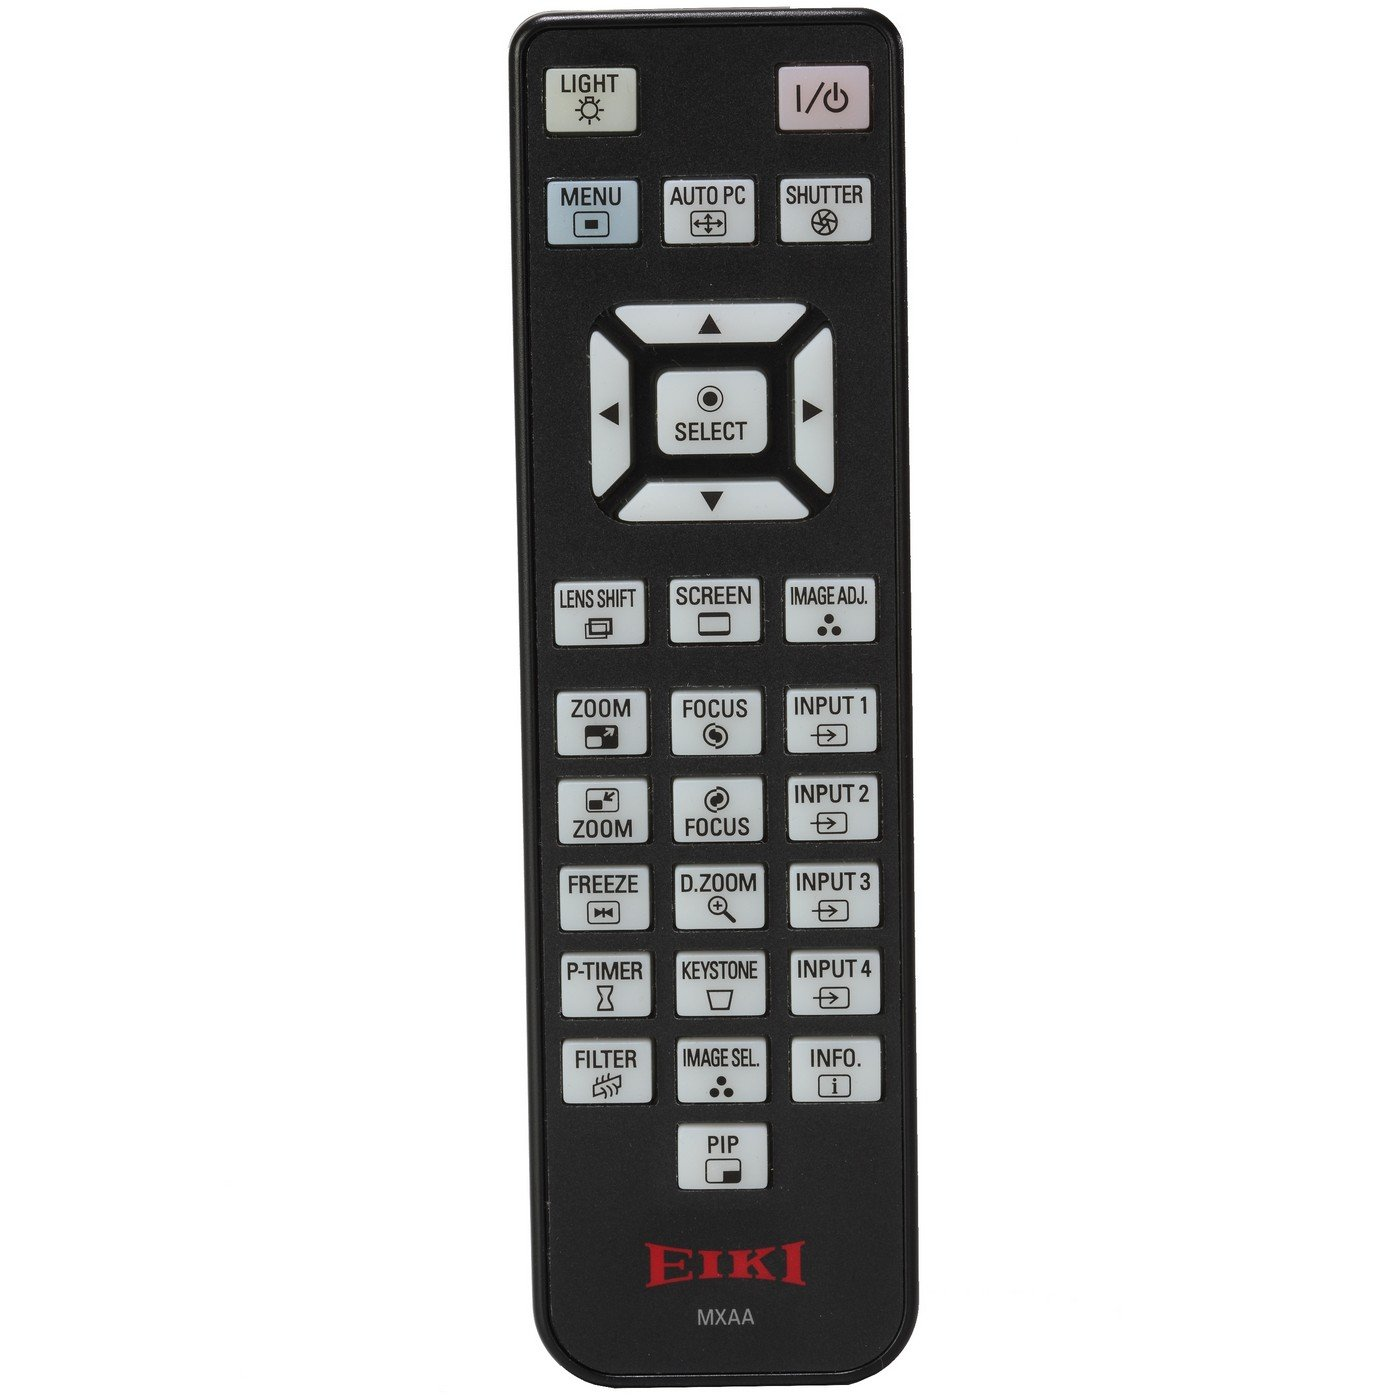 Eiki 645 099 0205   Infrared Wired Remote Control for EIP-SXG20 EIP-HDT20